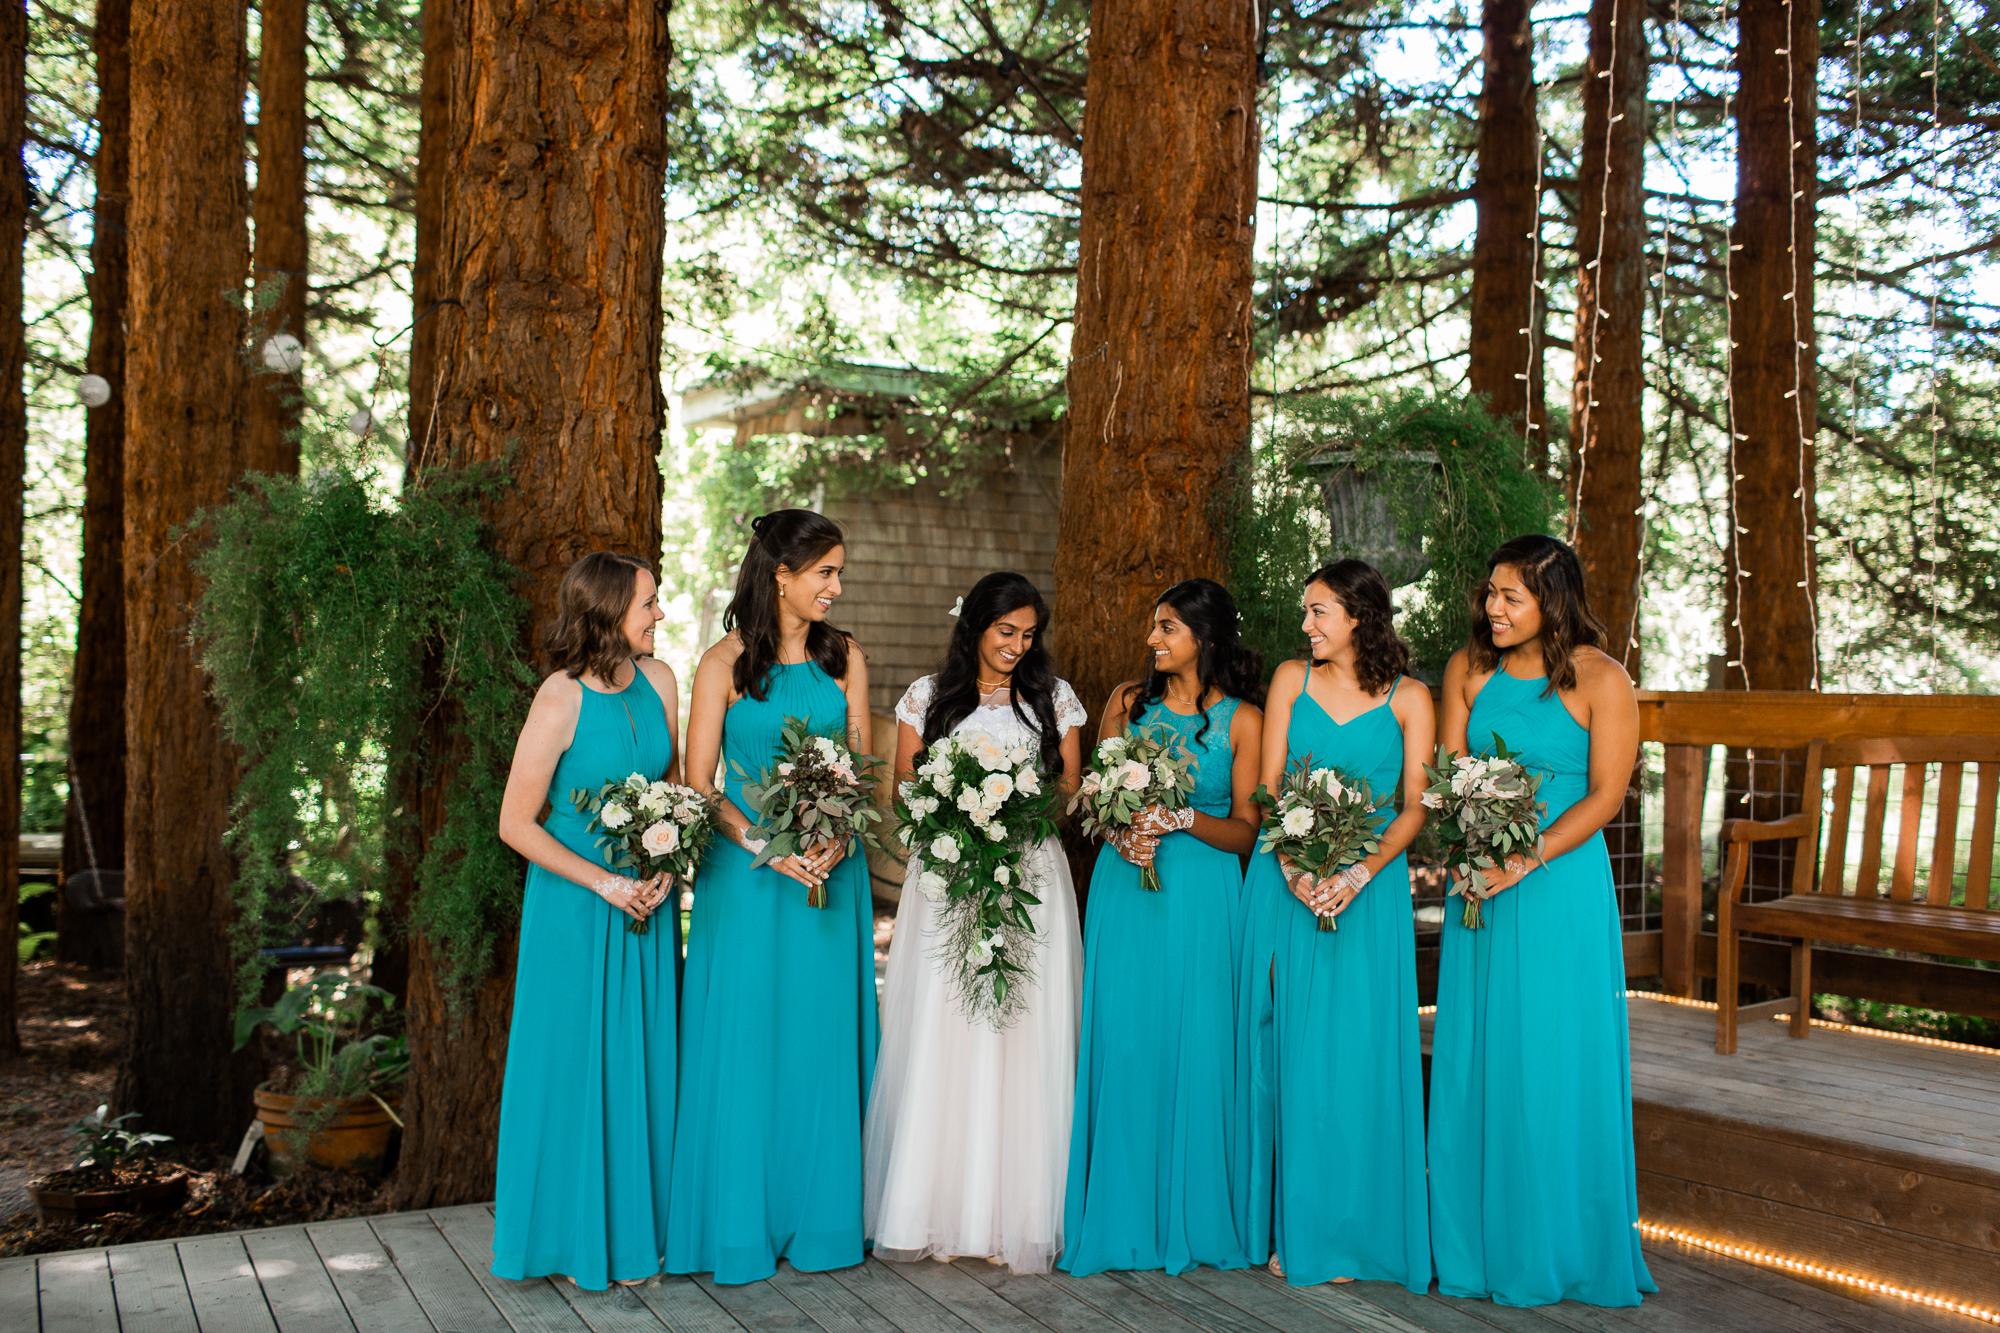 bodega bay wedding, bodega bay secret gardens, bodega bay secret gardens wedding, maria villano photography, bodega bay wedding photographer